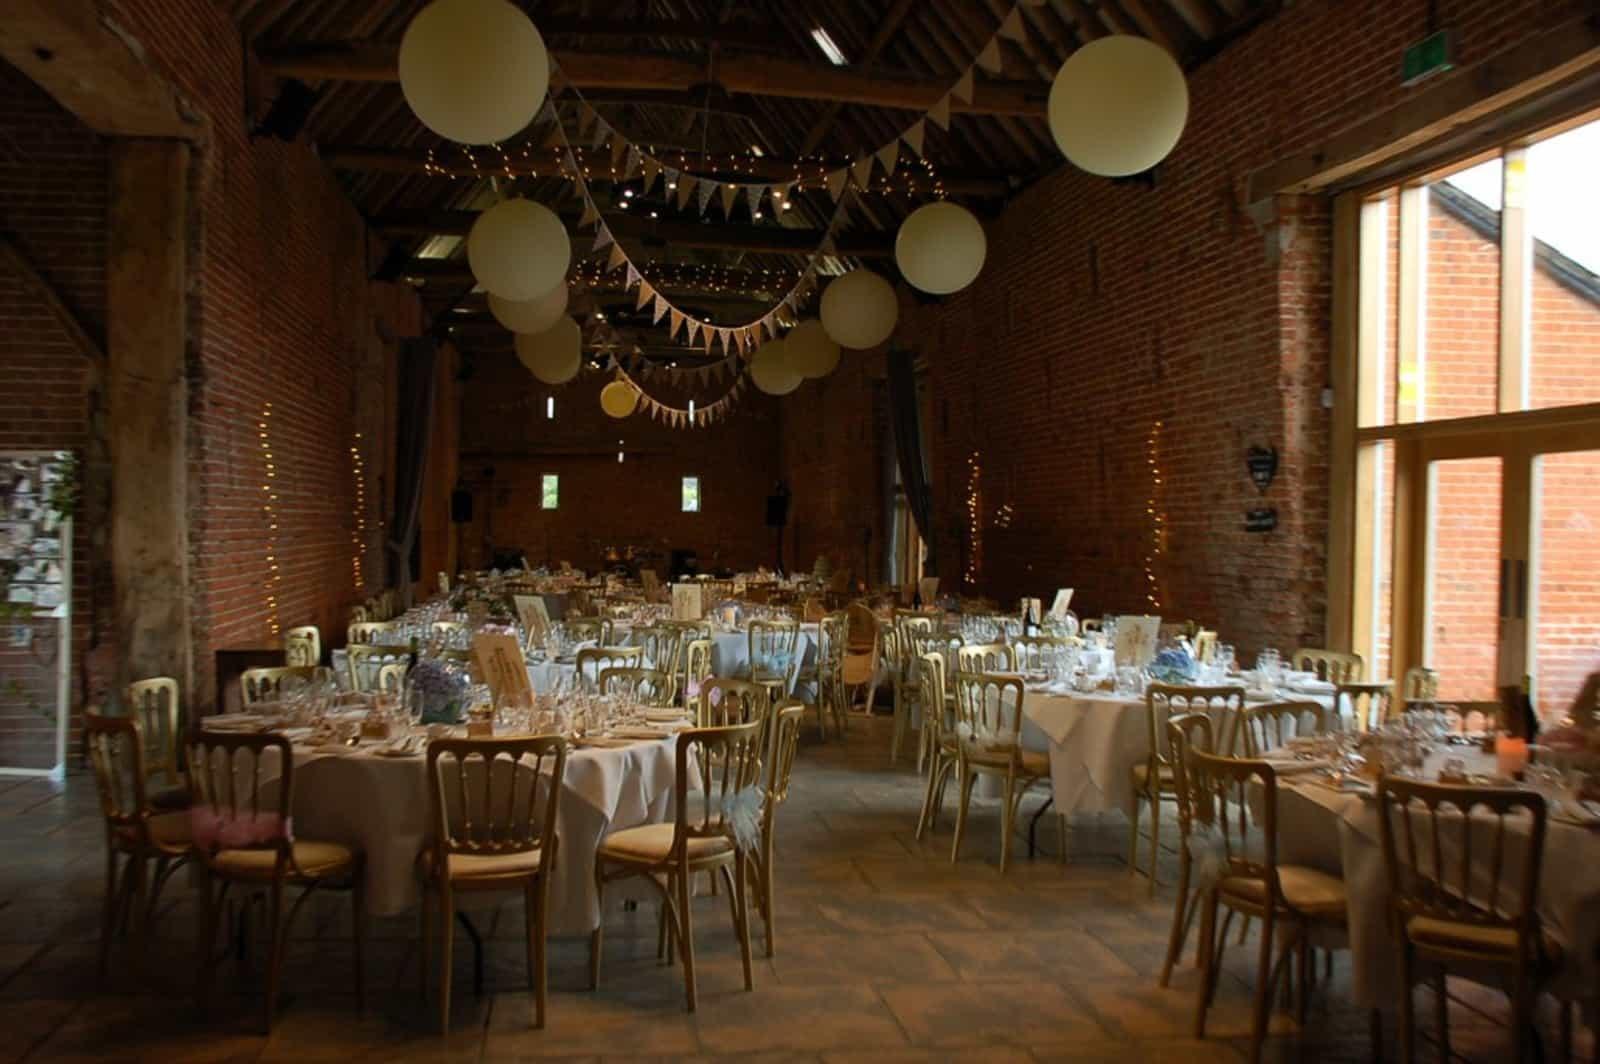 Copdock-Hall-barn-inside-1030×685